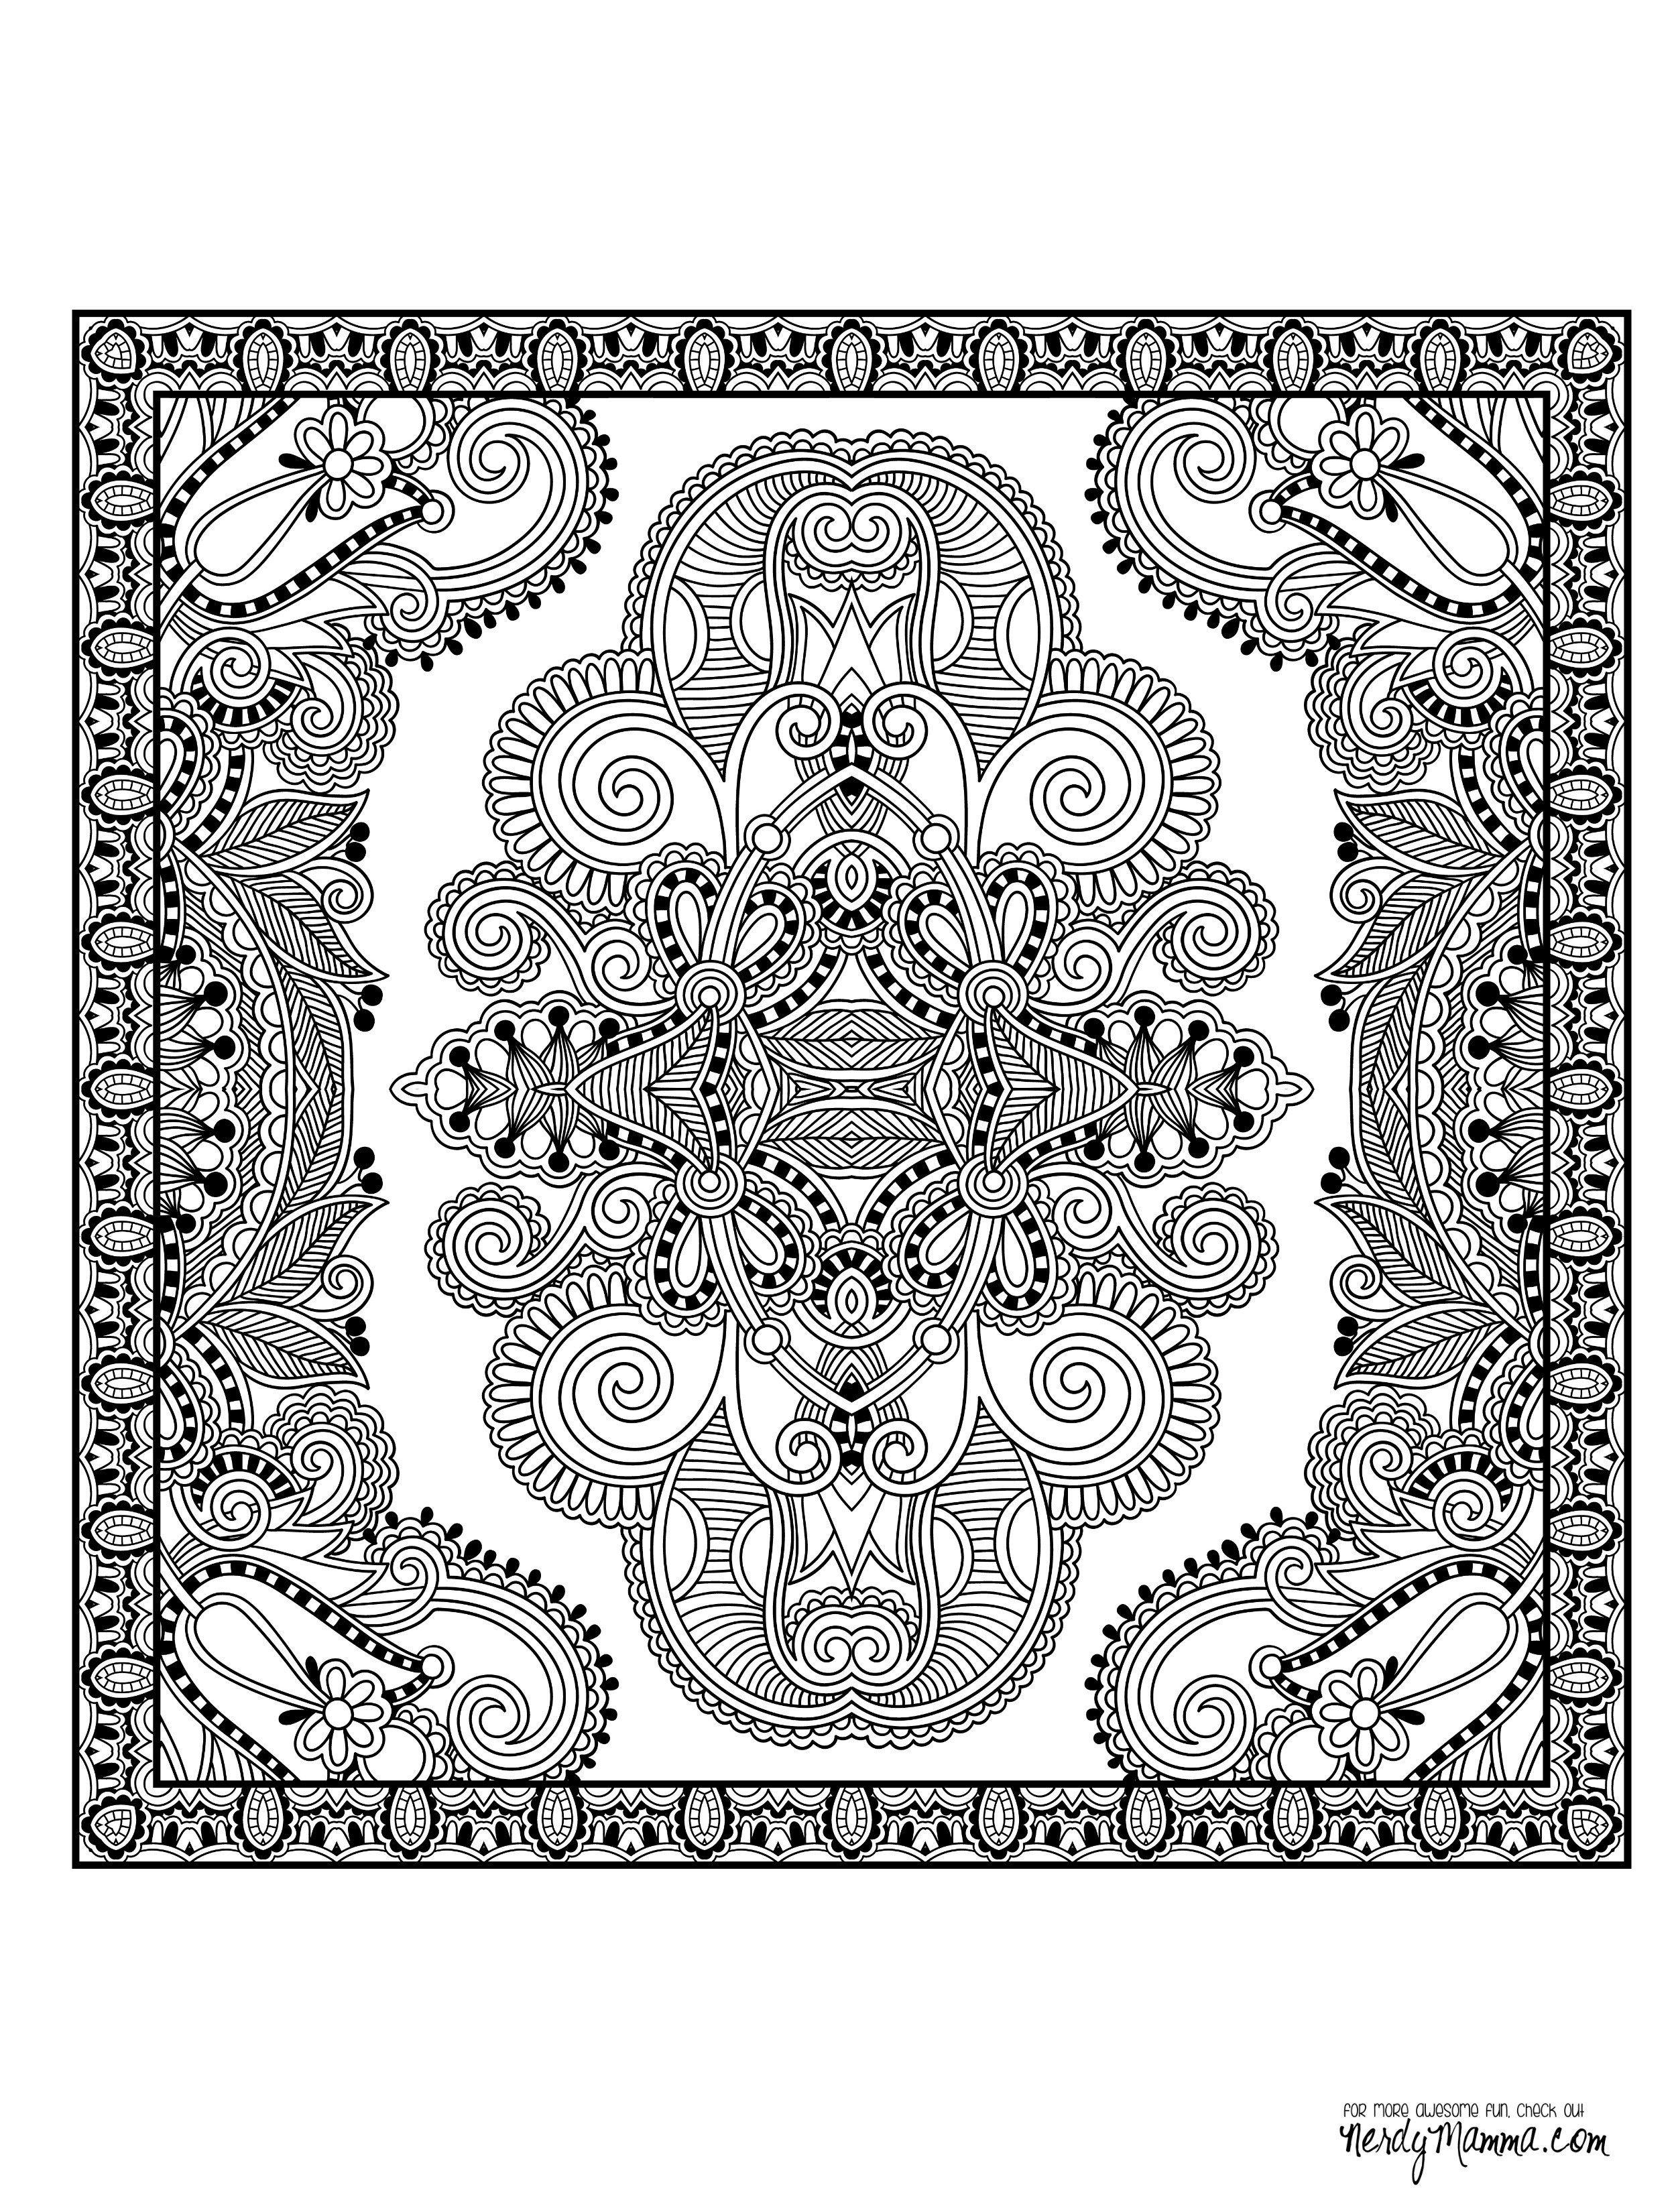 11 Free Printable Adult Coloring Pages | Mandalas y Dibujo